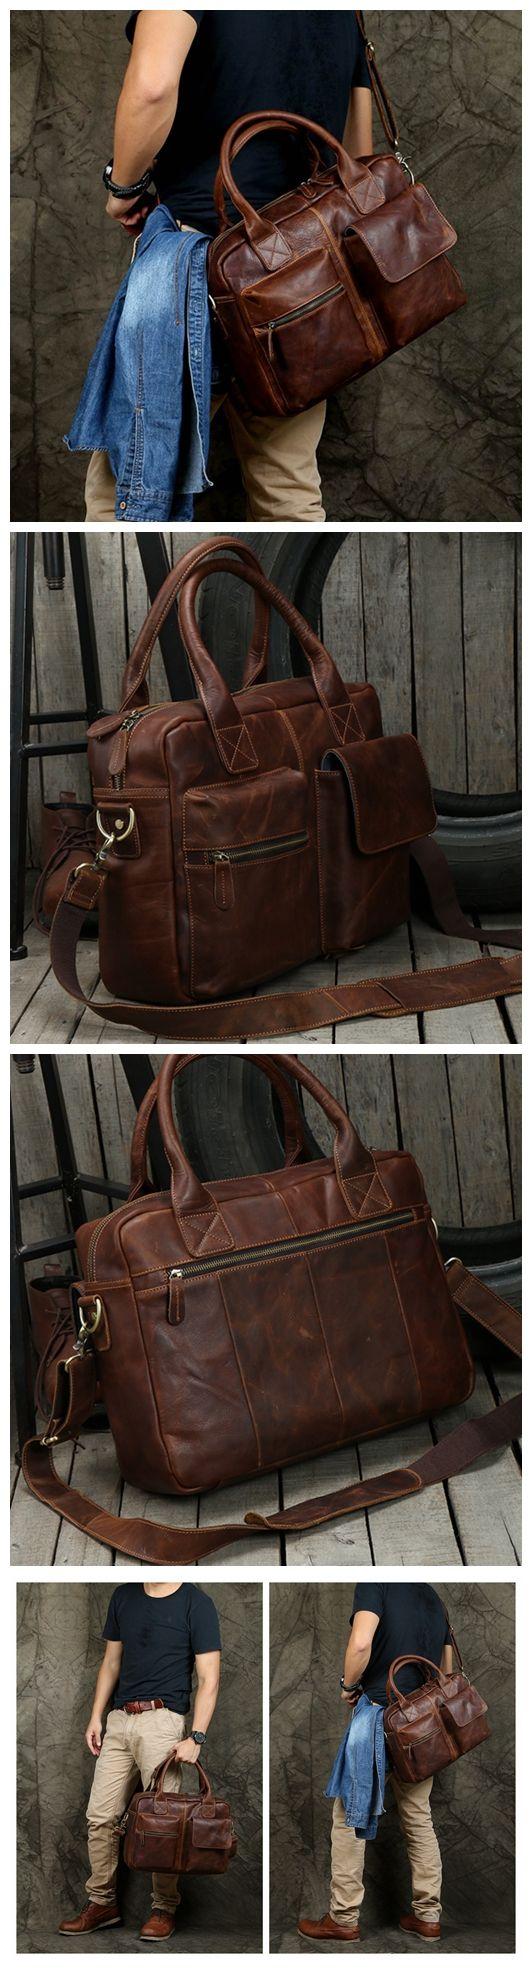 0a5b9d319ae7 Handmade Dark Brown Top Grain Leather Briefcase Men s Handbag Messenger Bag  15   Laptop Bag NZ03 - Dark Brown